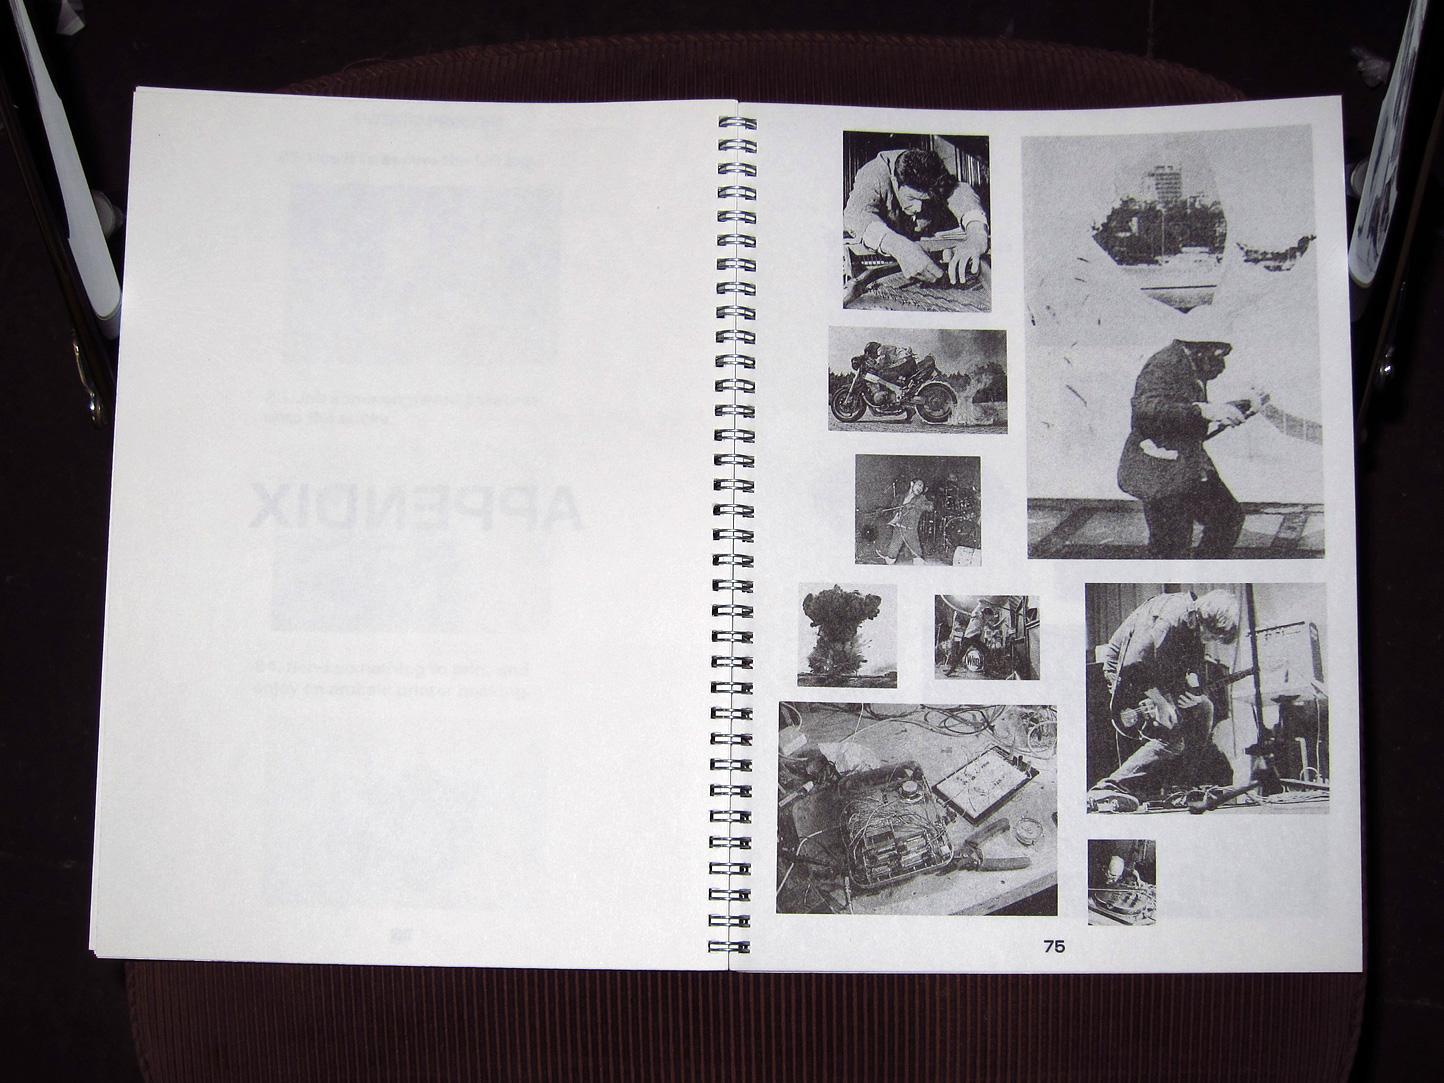 Xavier color printing - Printing